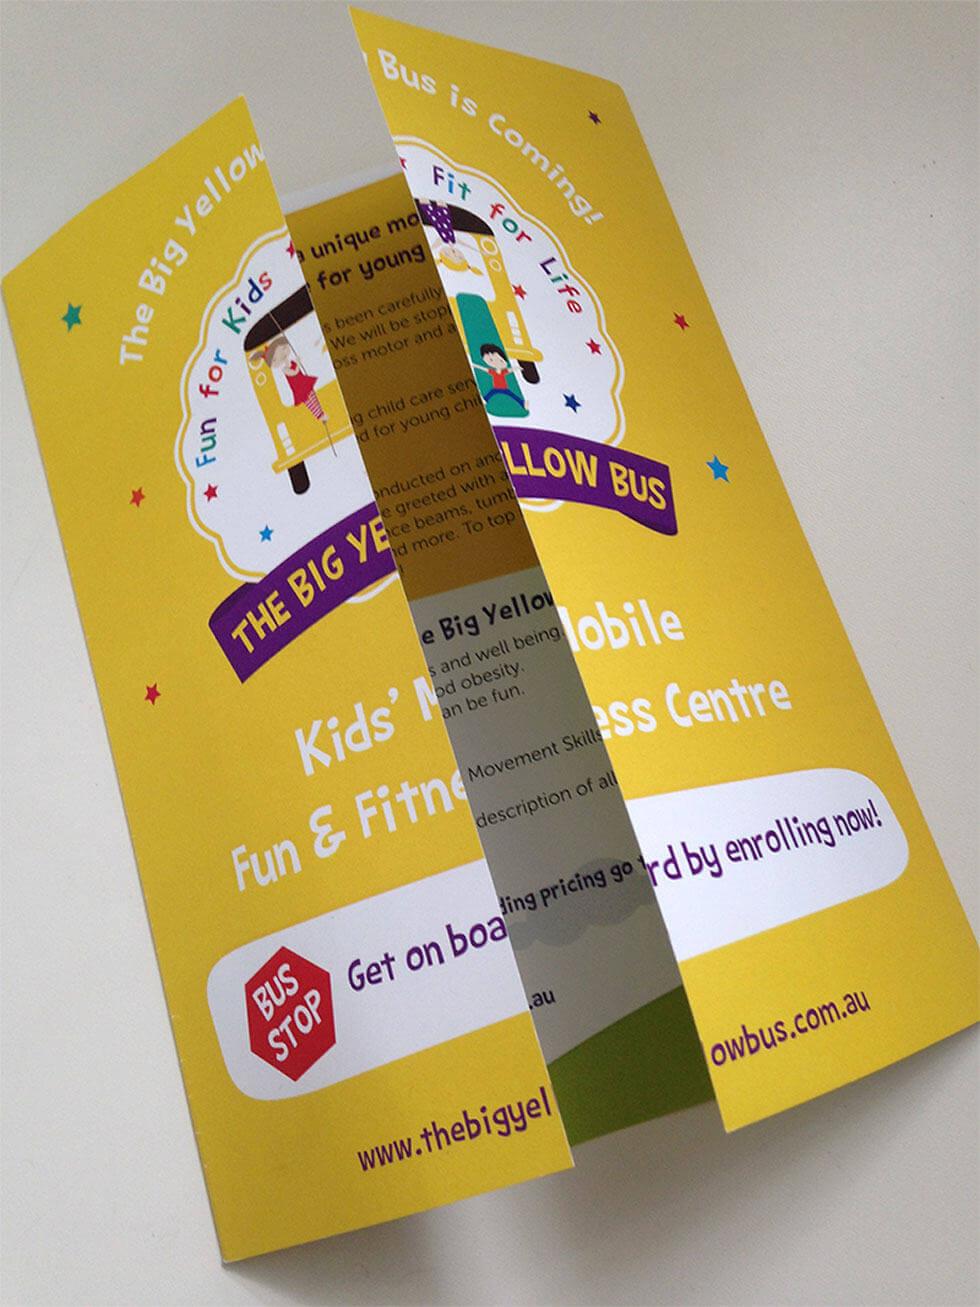 TBYB_IPADThe Big Yellow Bus Toddler & Preschool Gatefold Brochure Design